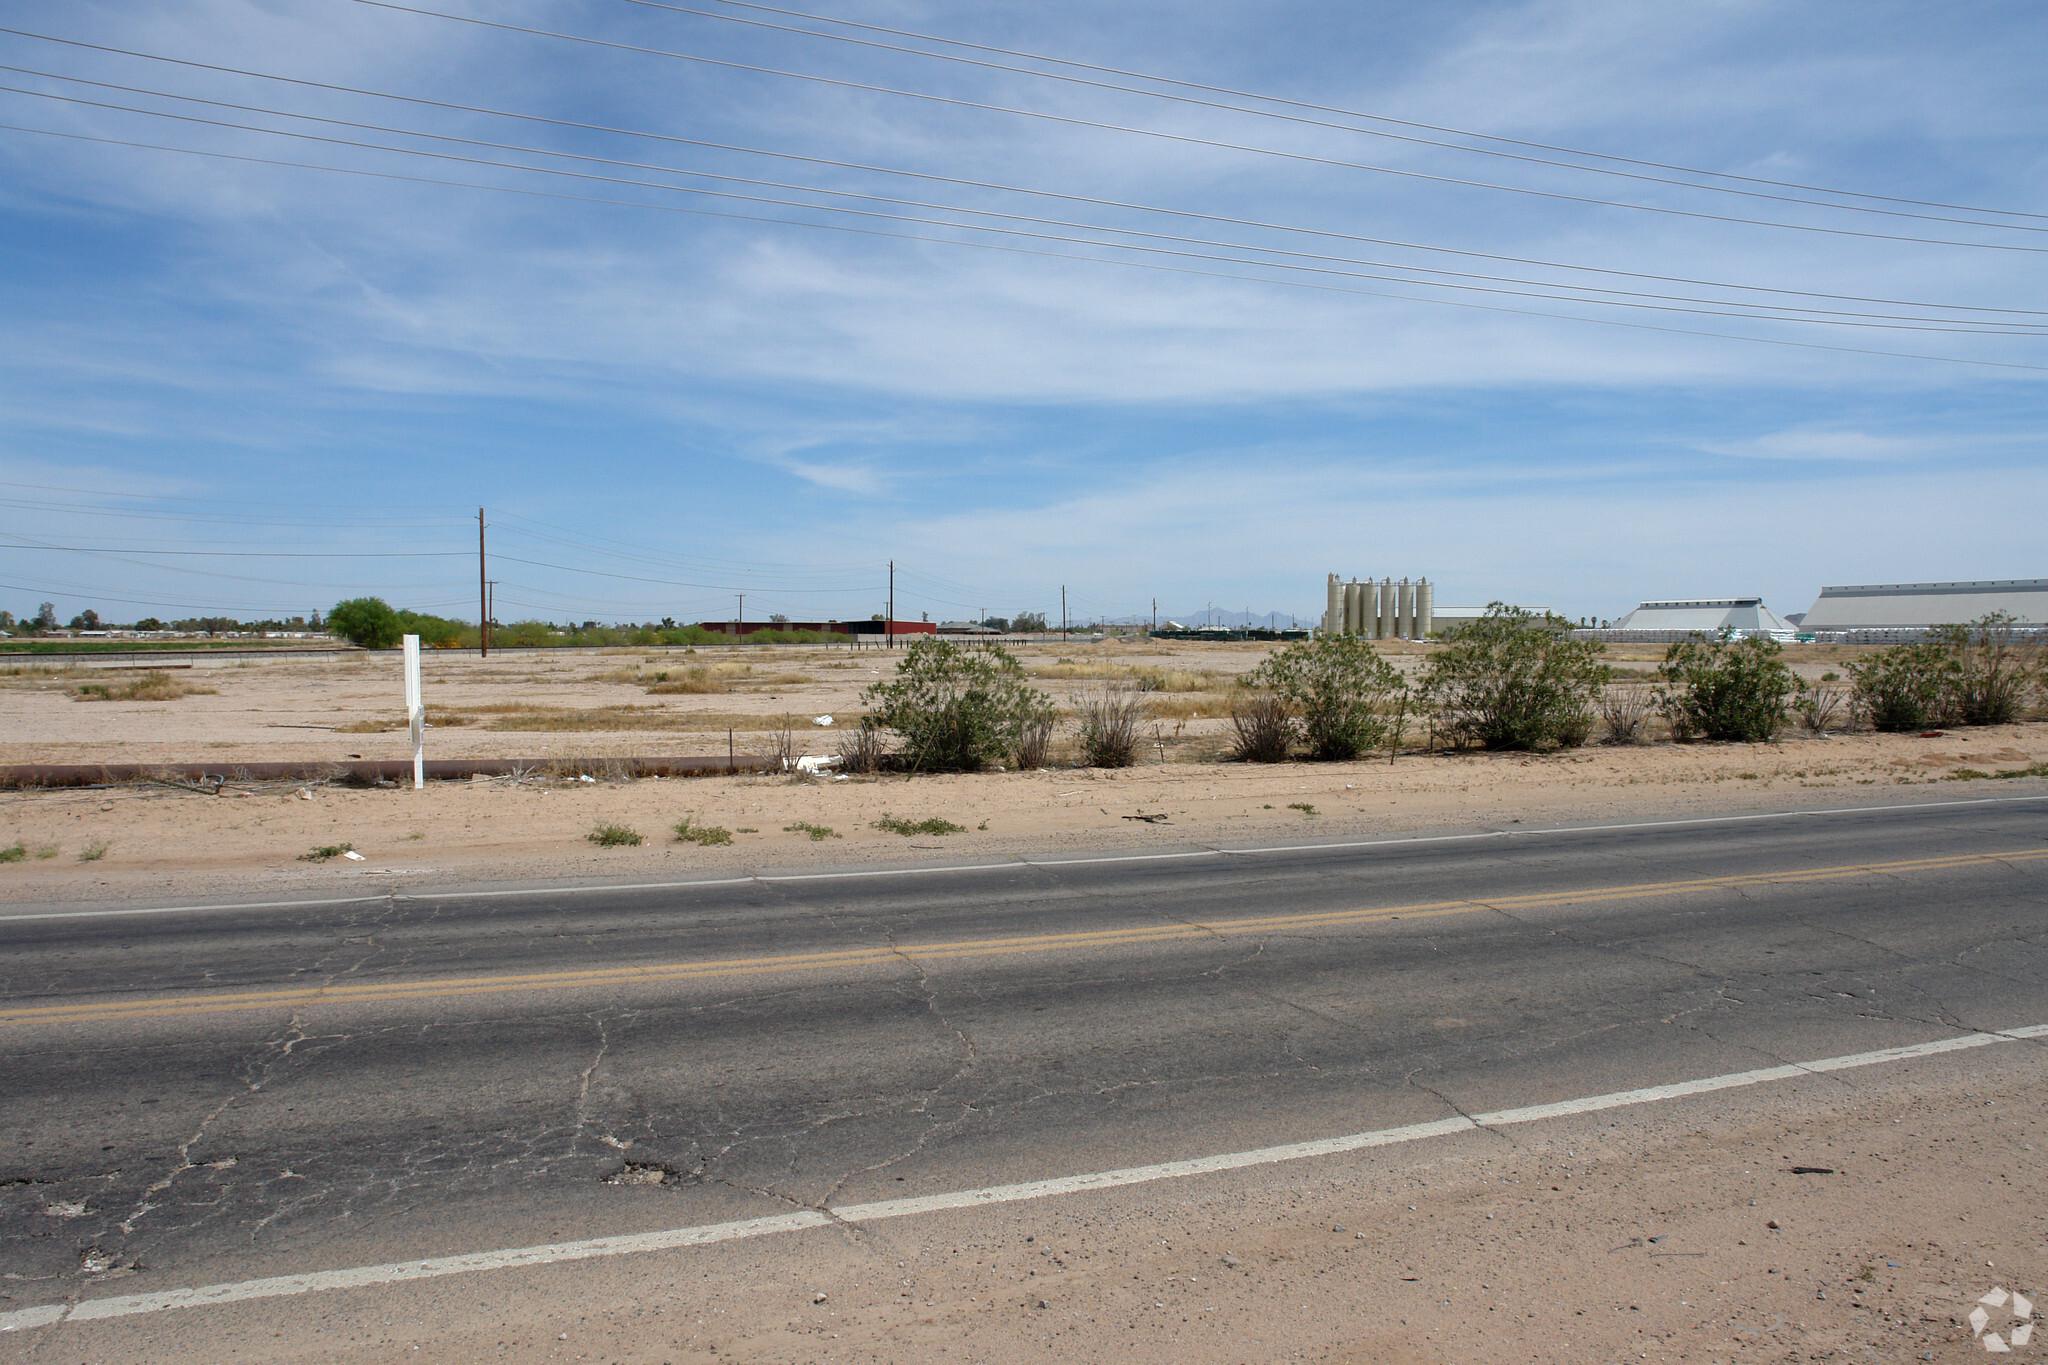 1398 N Thornton Rd, Casa Grande AZ 85122 Industrial Land